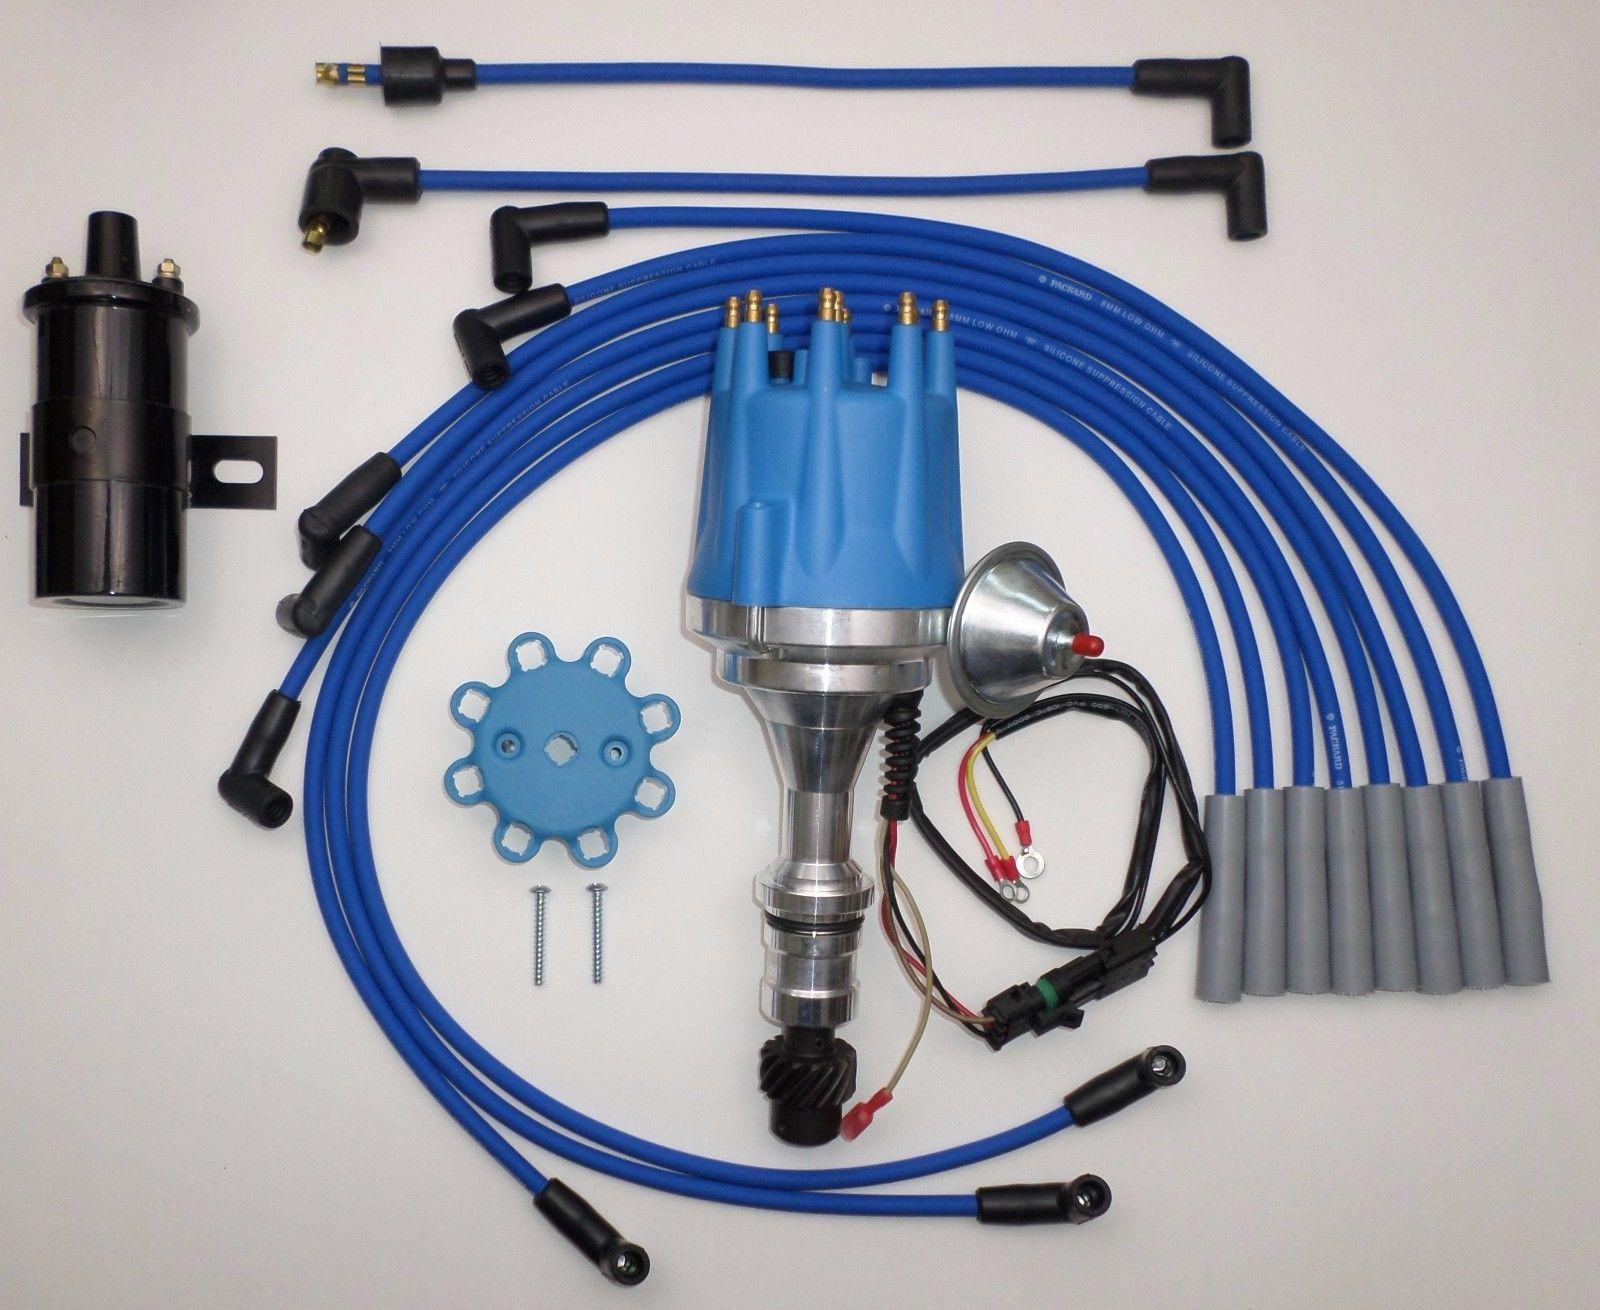 small cap oldsmobile 350,400,403,455 blue hei distributor 45k black coil  plug wires - swapmeetparts  swapmeetparts